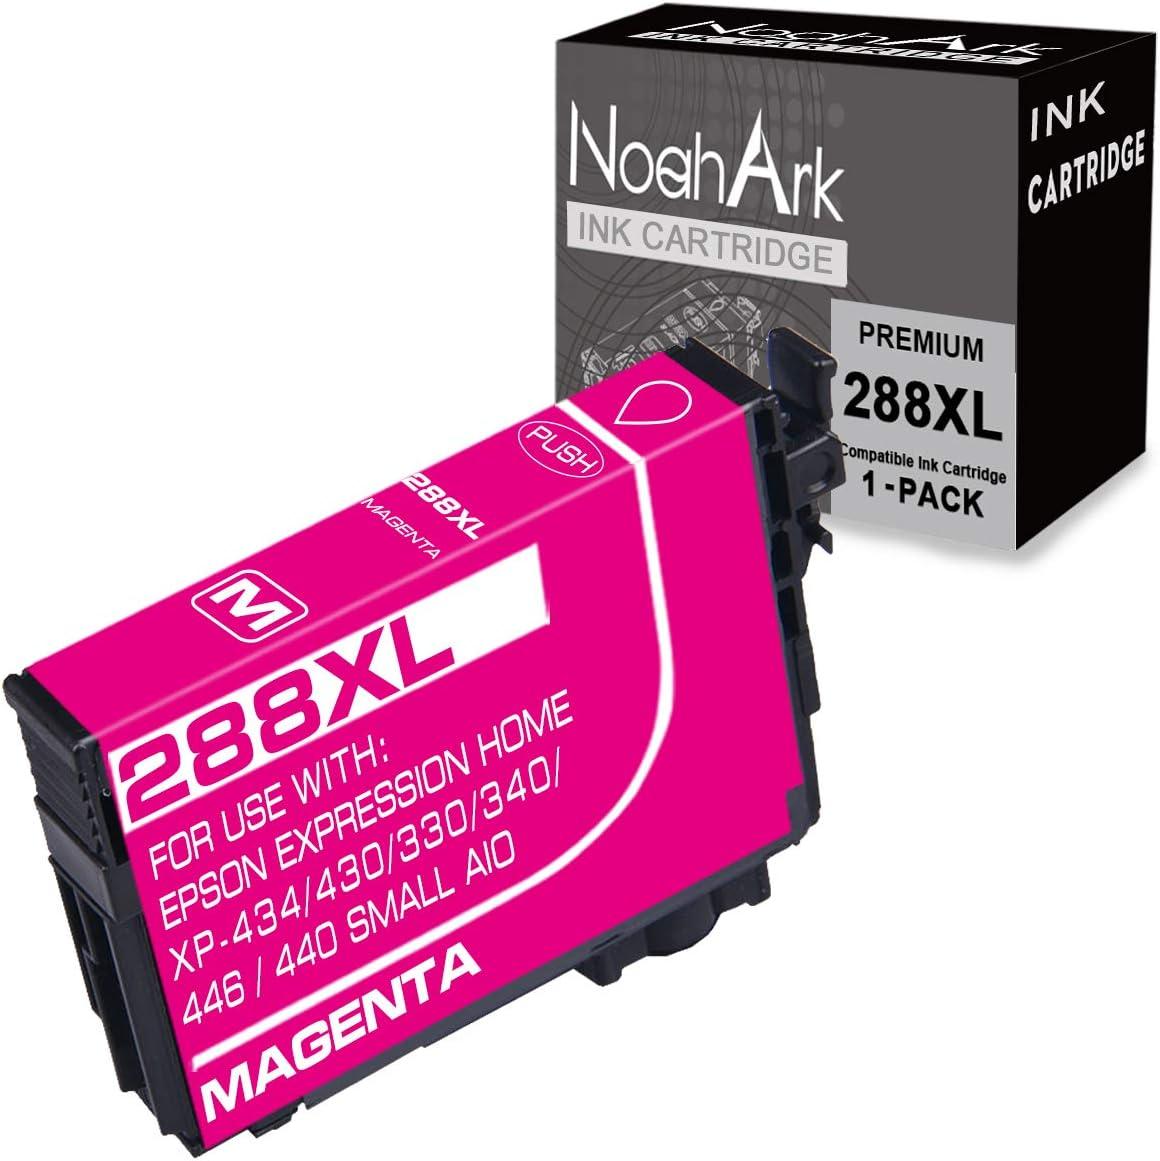 NoahArk 1 Packs 288XL Remanufacture Ink Cartridges Replacement for Epson 288 XL 288XL T288XL for Expression Home XP-430 XP-440 XP-330 XP-340 XP-434 XP-446 Printer (1 Magenta)